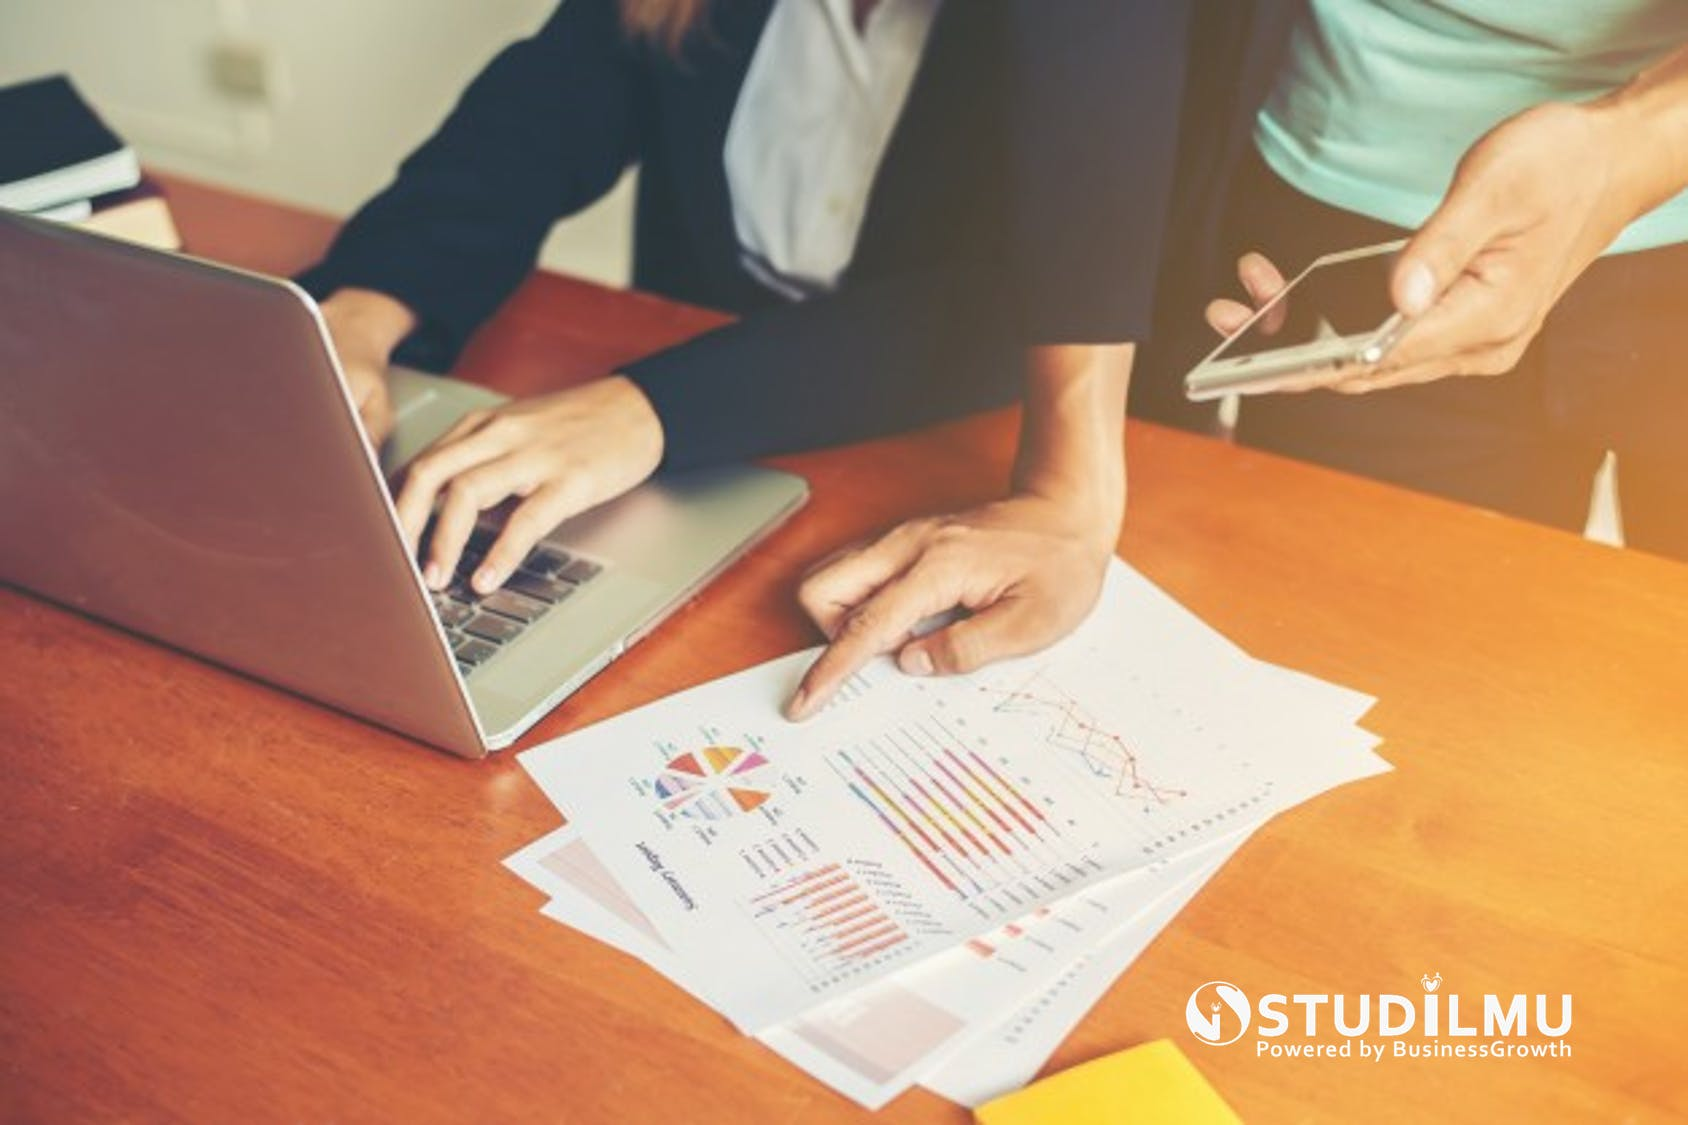 STUDILMU Career Advice - 15 Tips Menyampaikan Umpan Balik Konstruktif